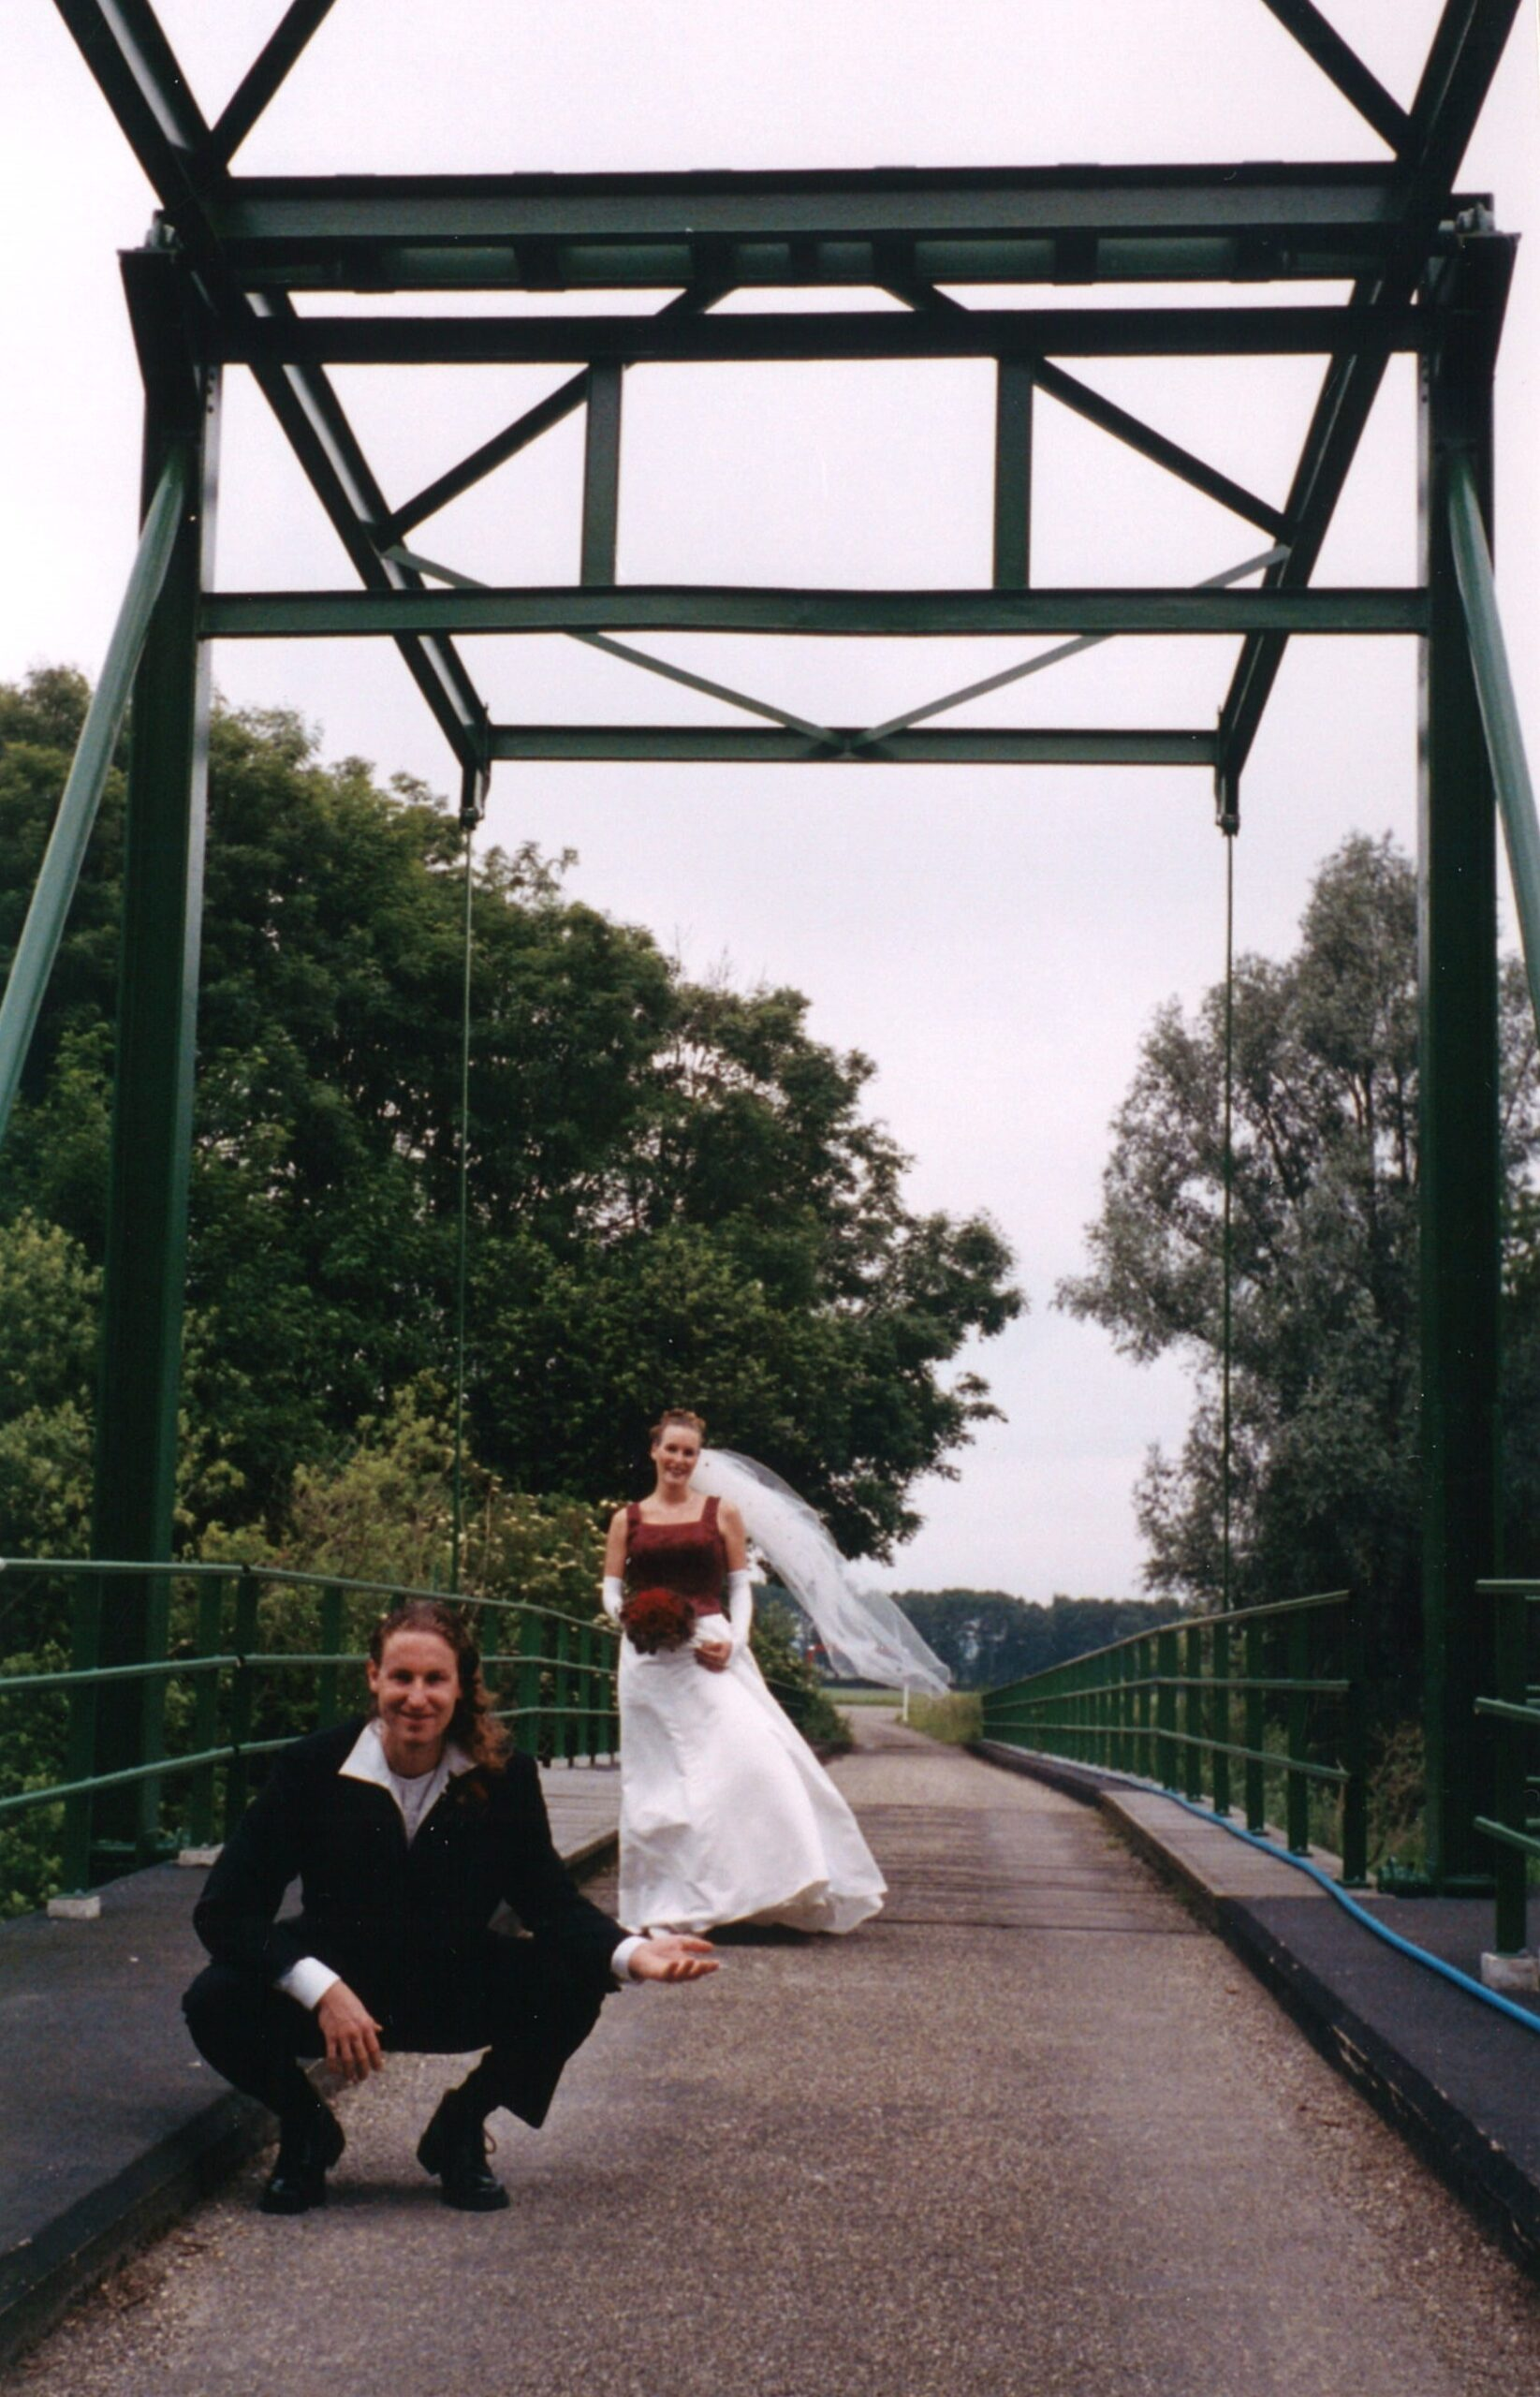 Huwelijksvoltrekking Biesbosch